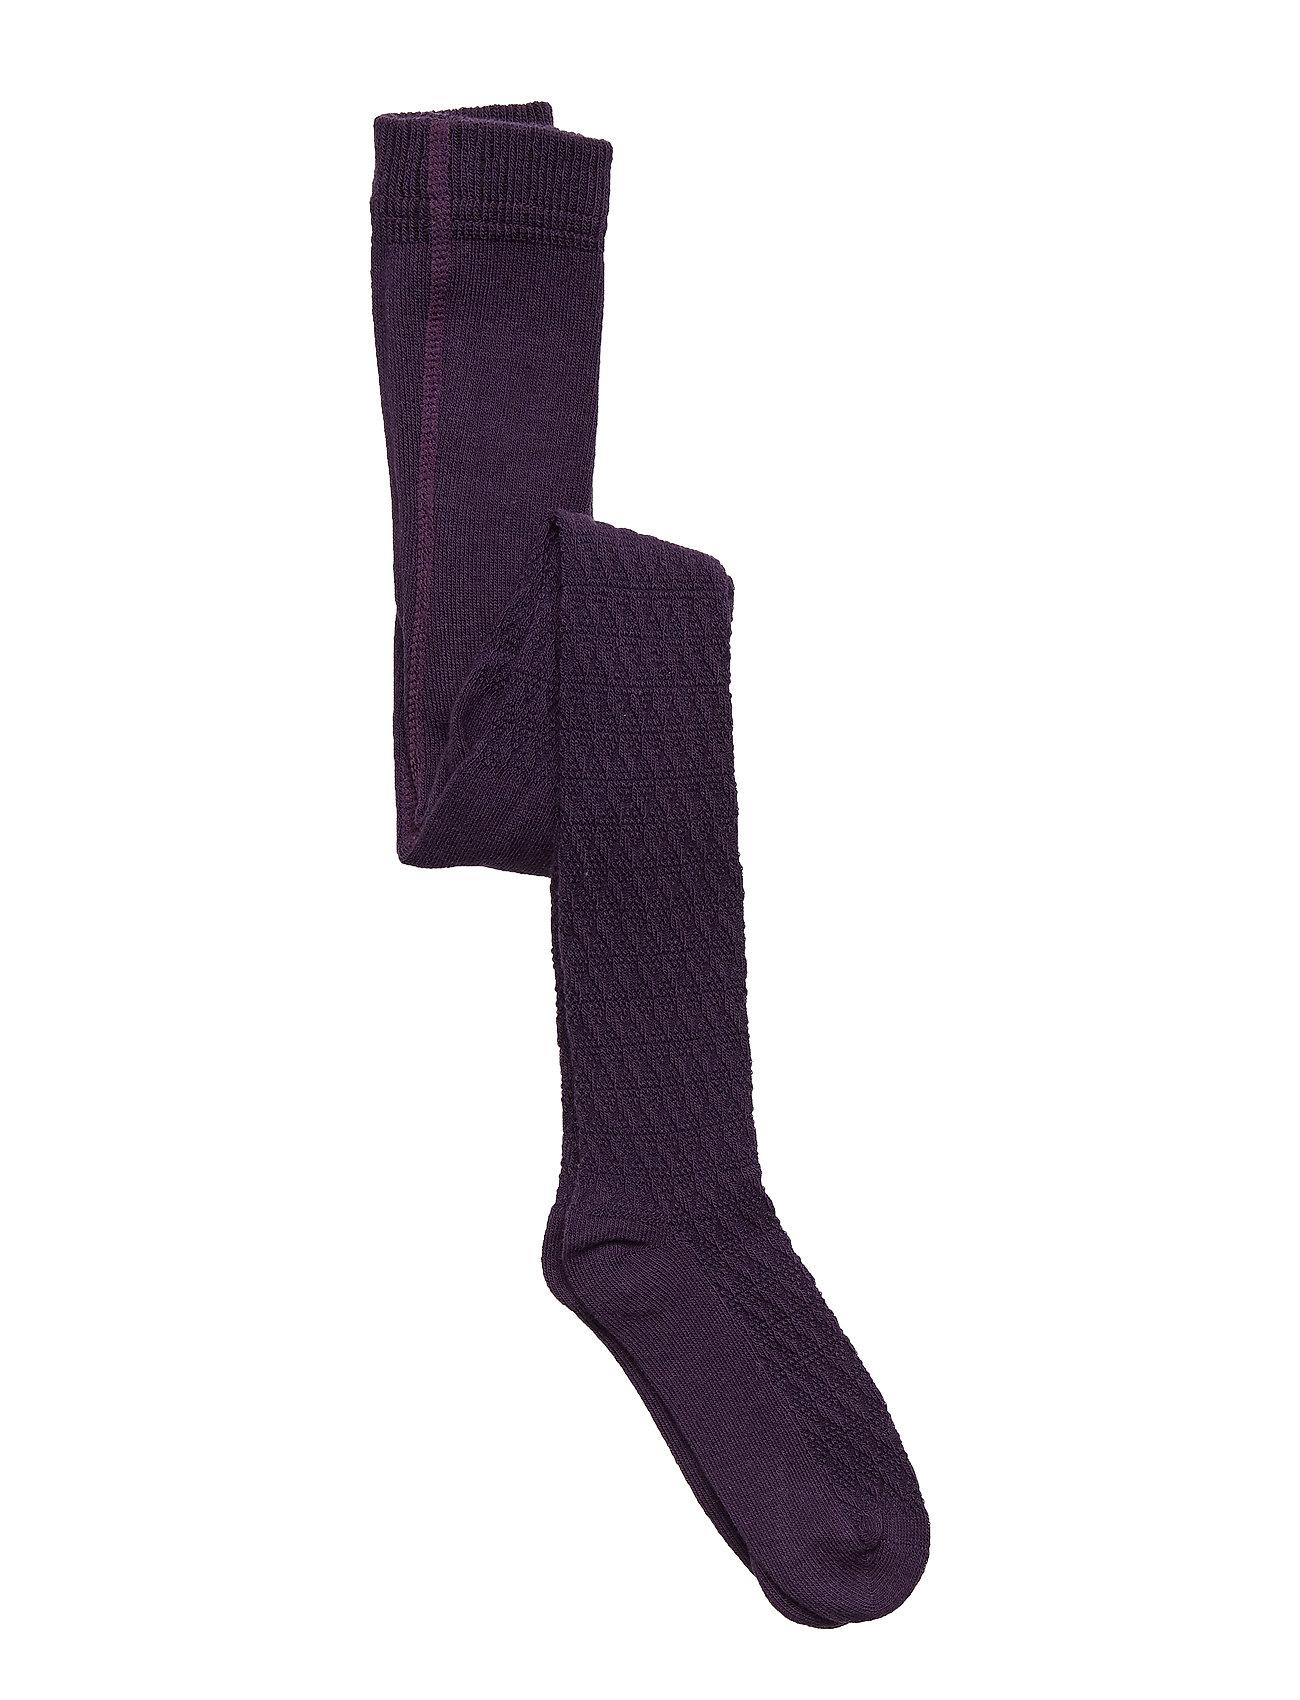 Creamie Stockings - NIGHTSHADE